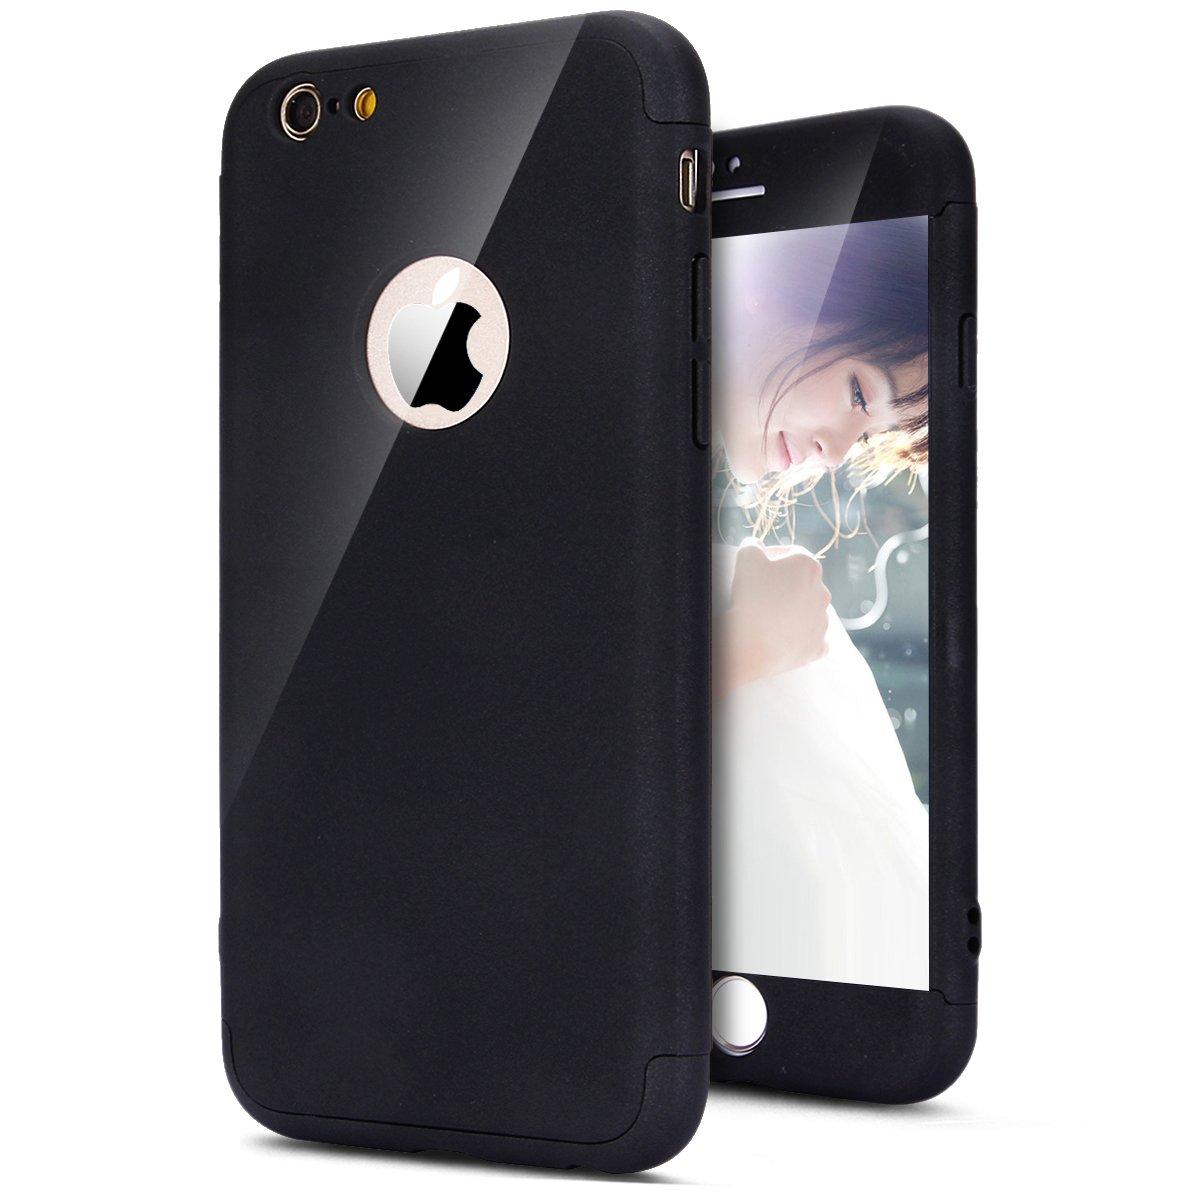 SainCat Custodia iPhone 6, iPhone 6S Cover 360 Gradi Full Body, Custodia Ultra Slim Plastica Rigida Protettiva Anti-Scratch Cover per iPhone 6/6S-Rosso FILP028039